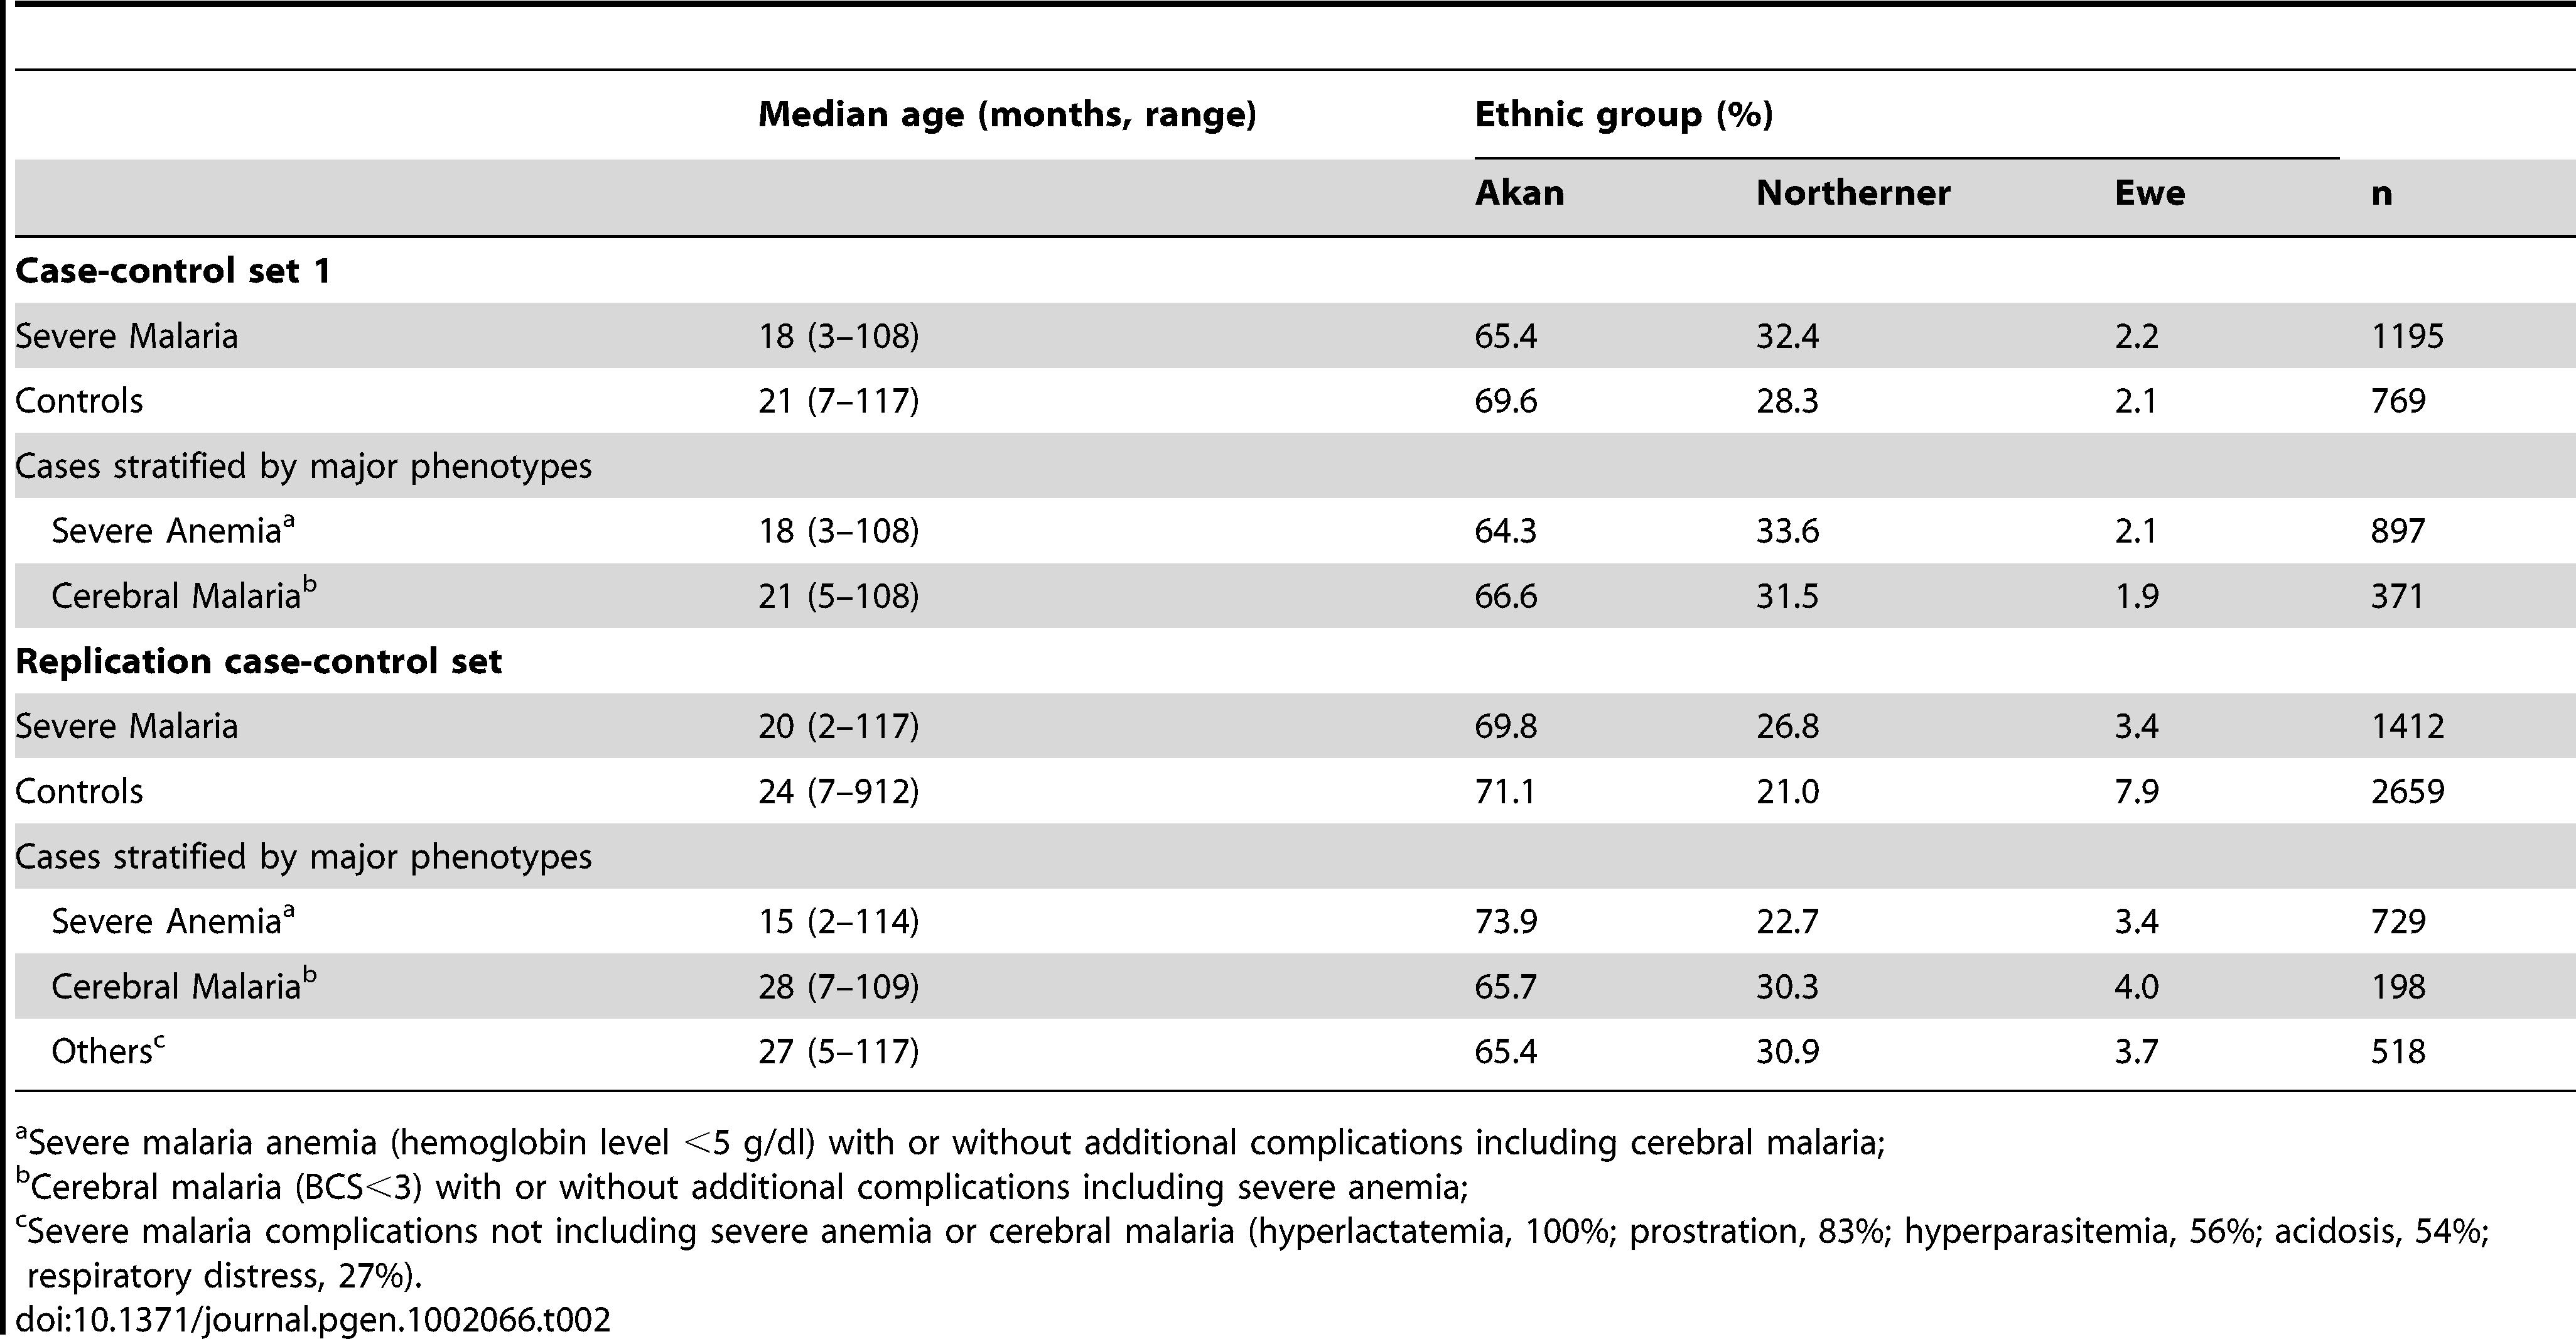 Characteristics of severe malaria case-control sample sets.